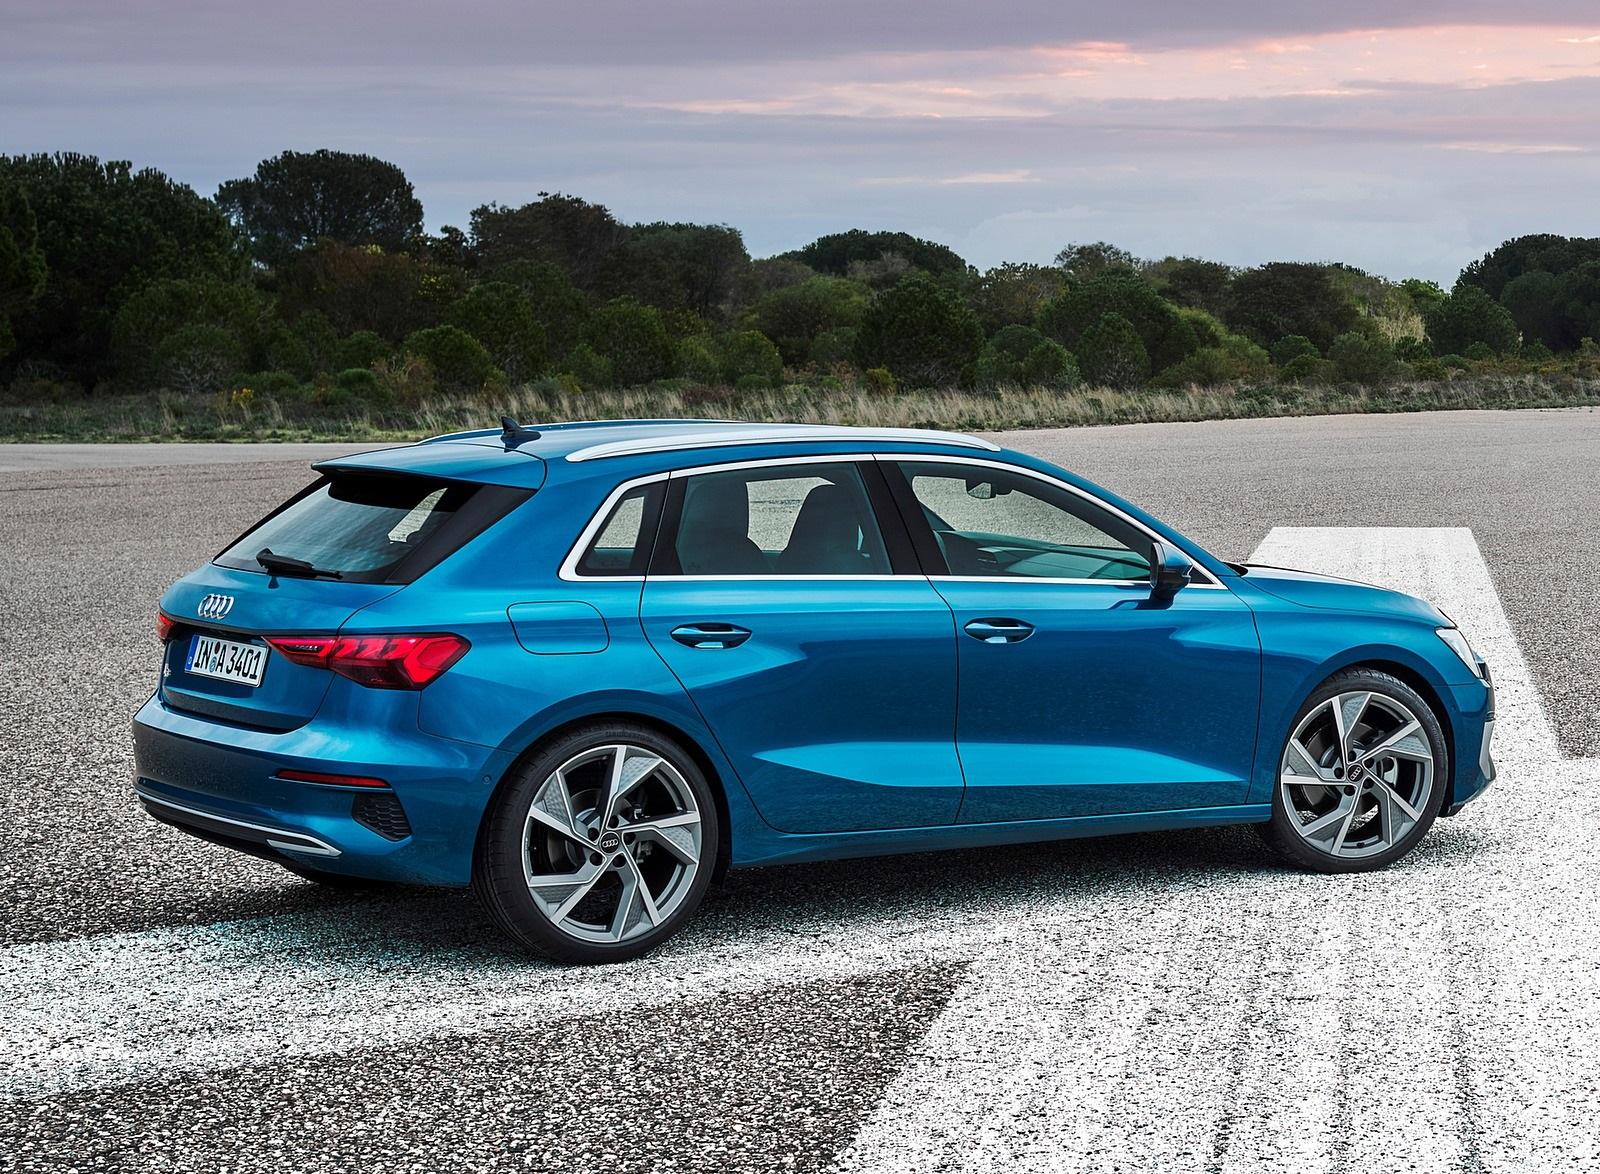 2021 Audi A3 Sportback (Color: Atoll Blue) Rear Three-Quarter Wallpapers (9)